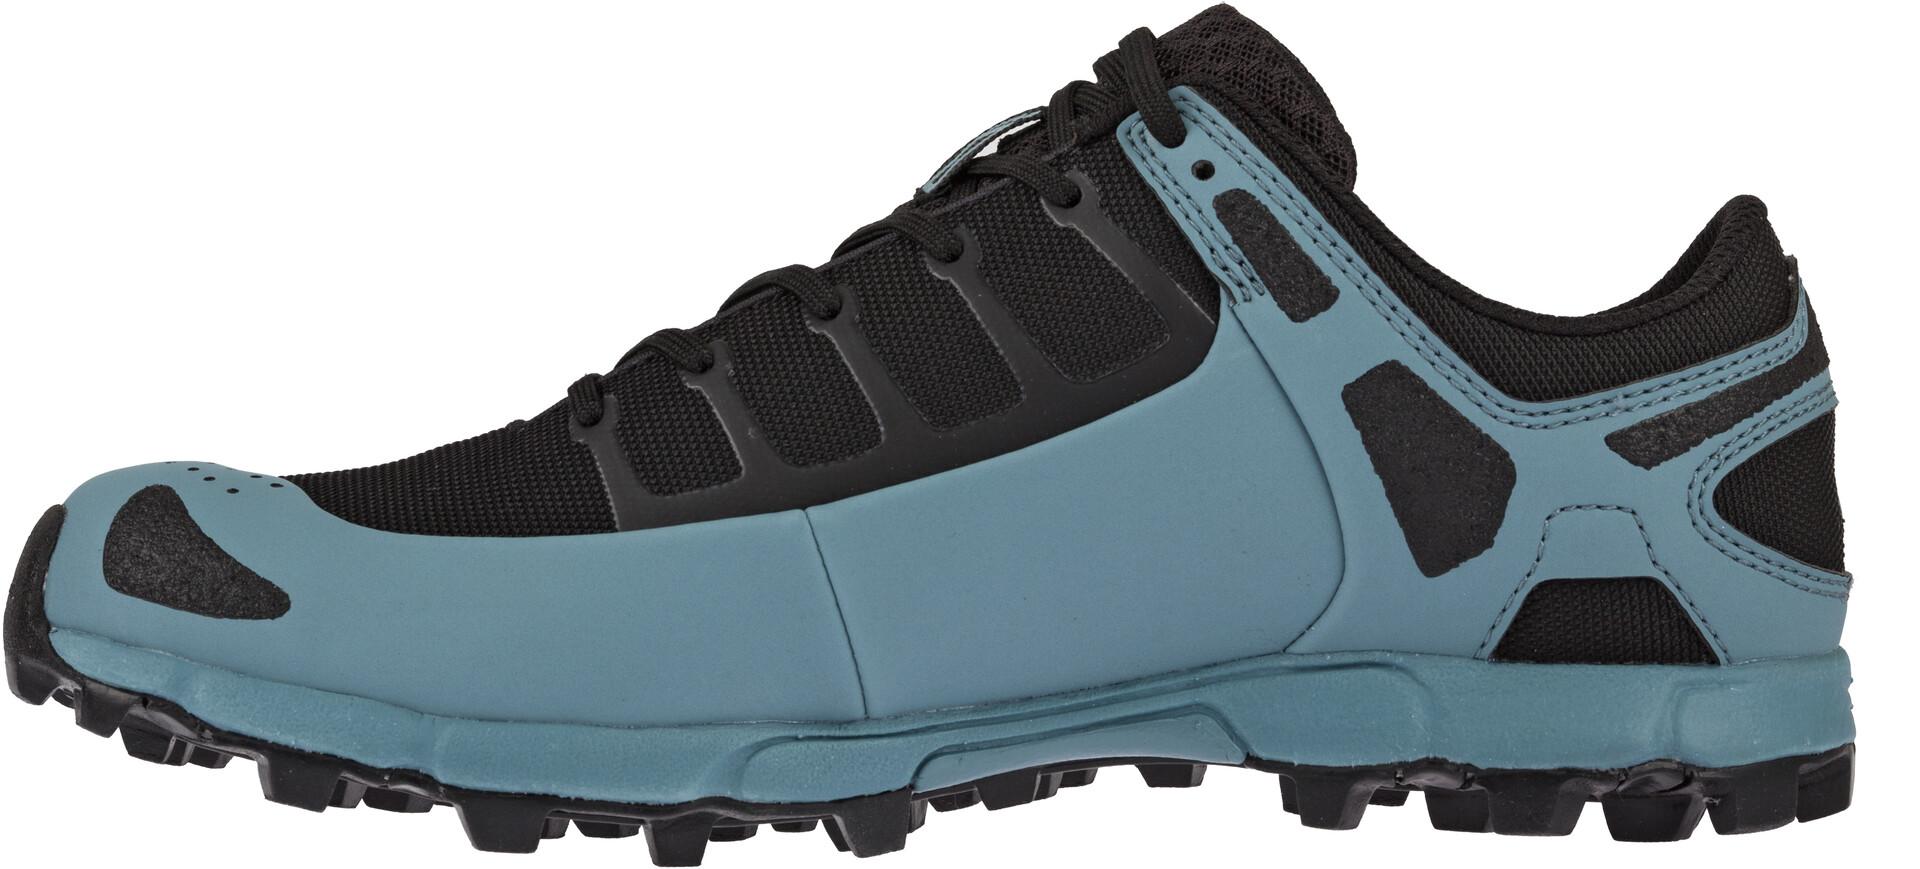 inov 8 X Talon 230 Running Shoes Dame black blue grey